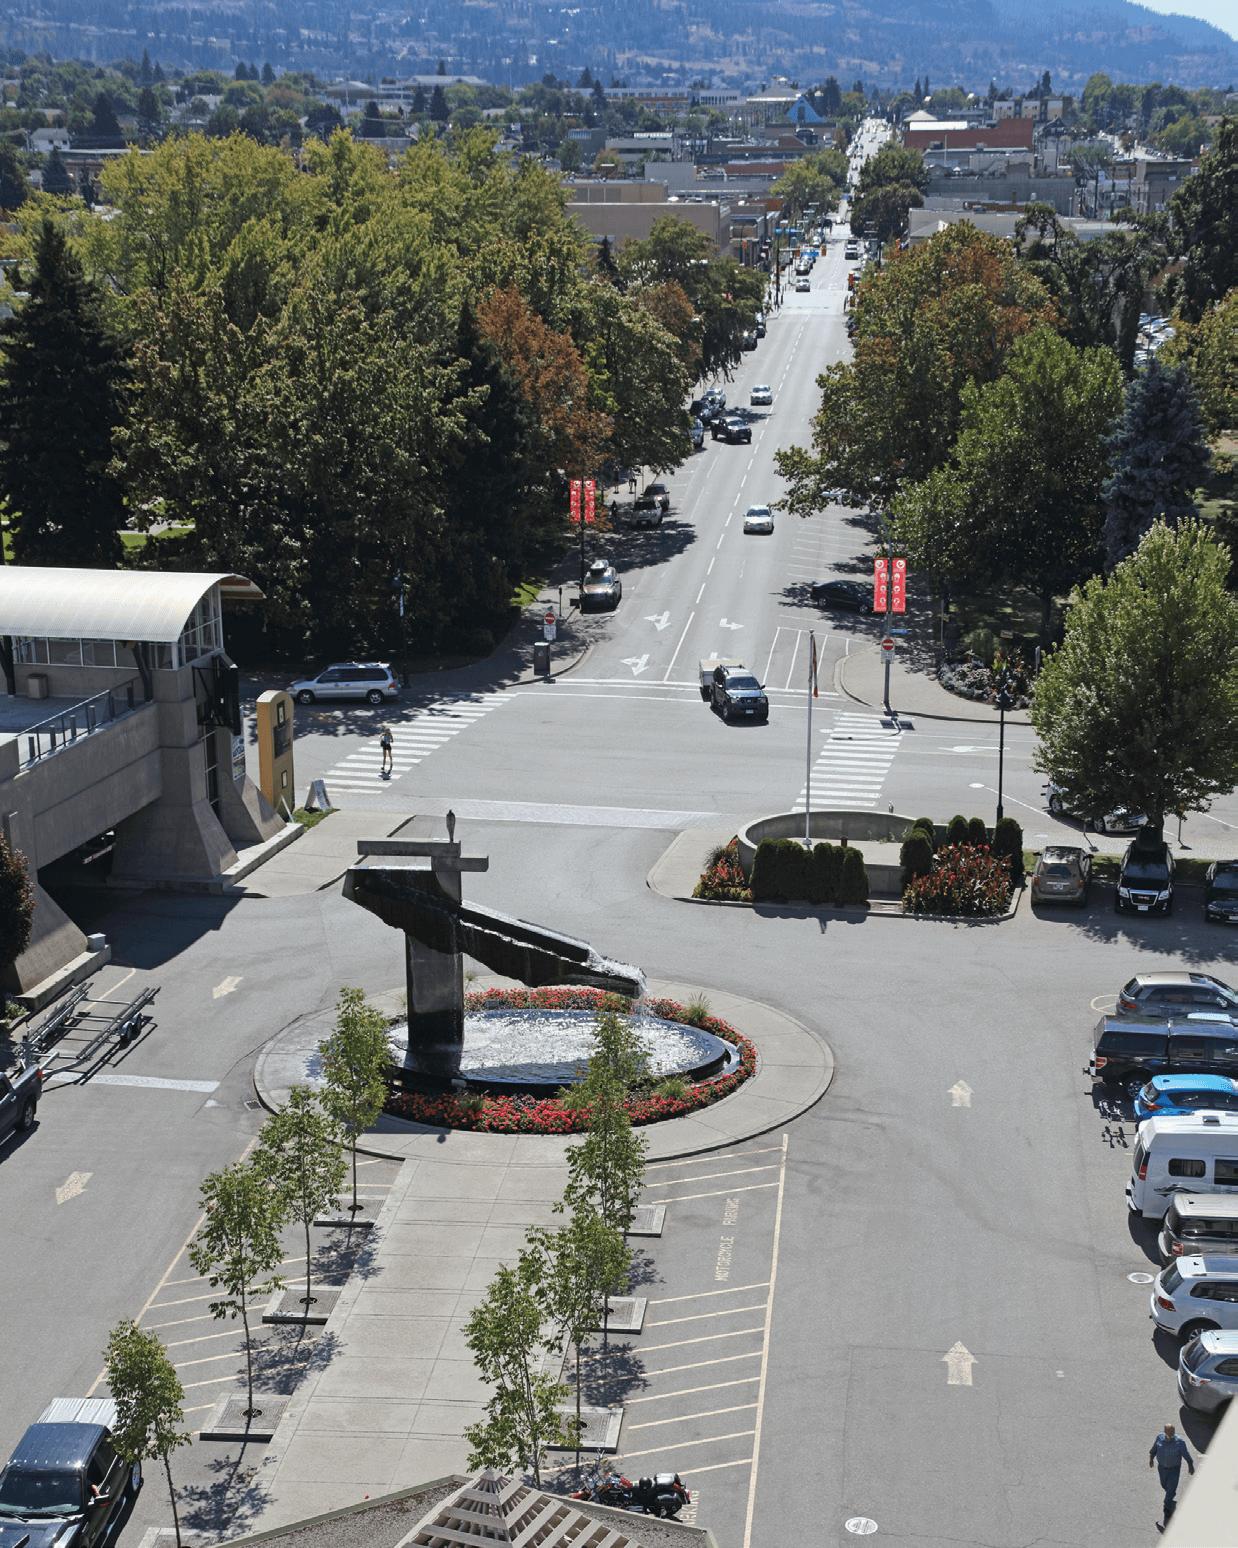 downtown-penticton-street